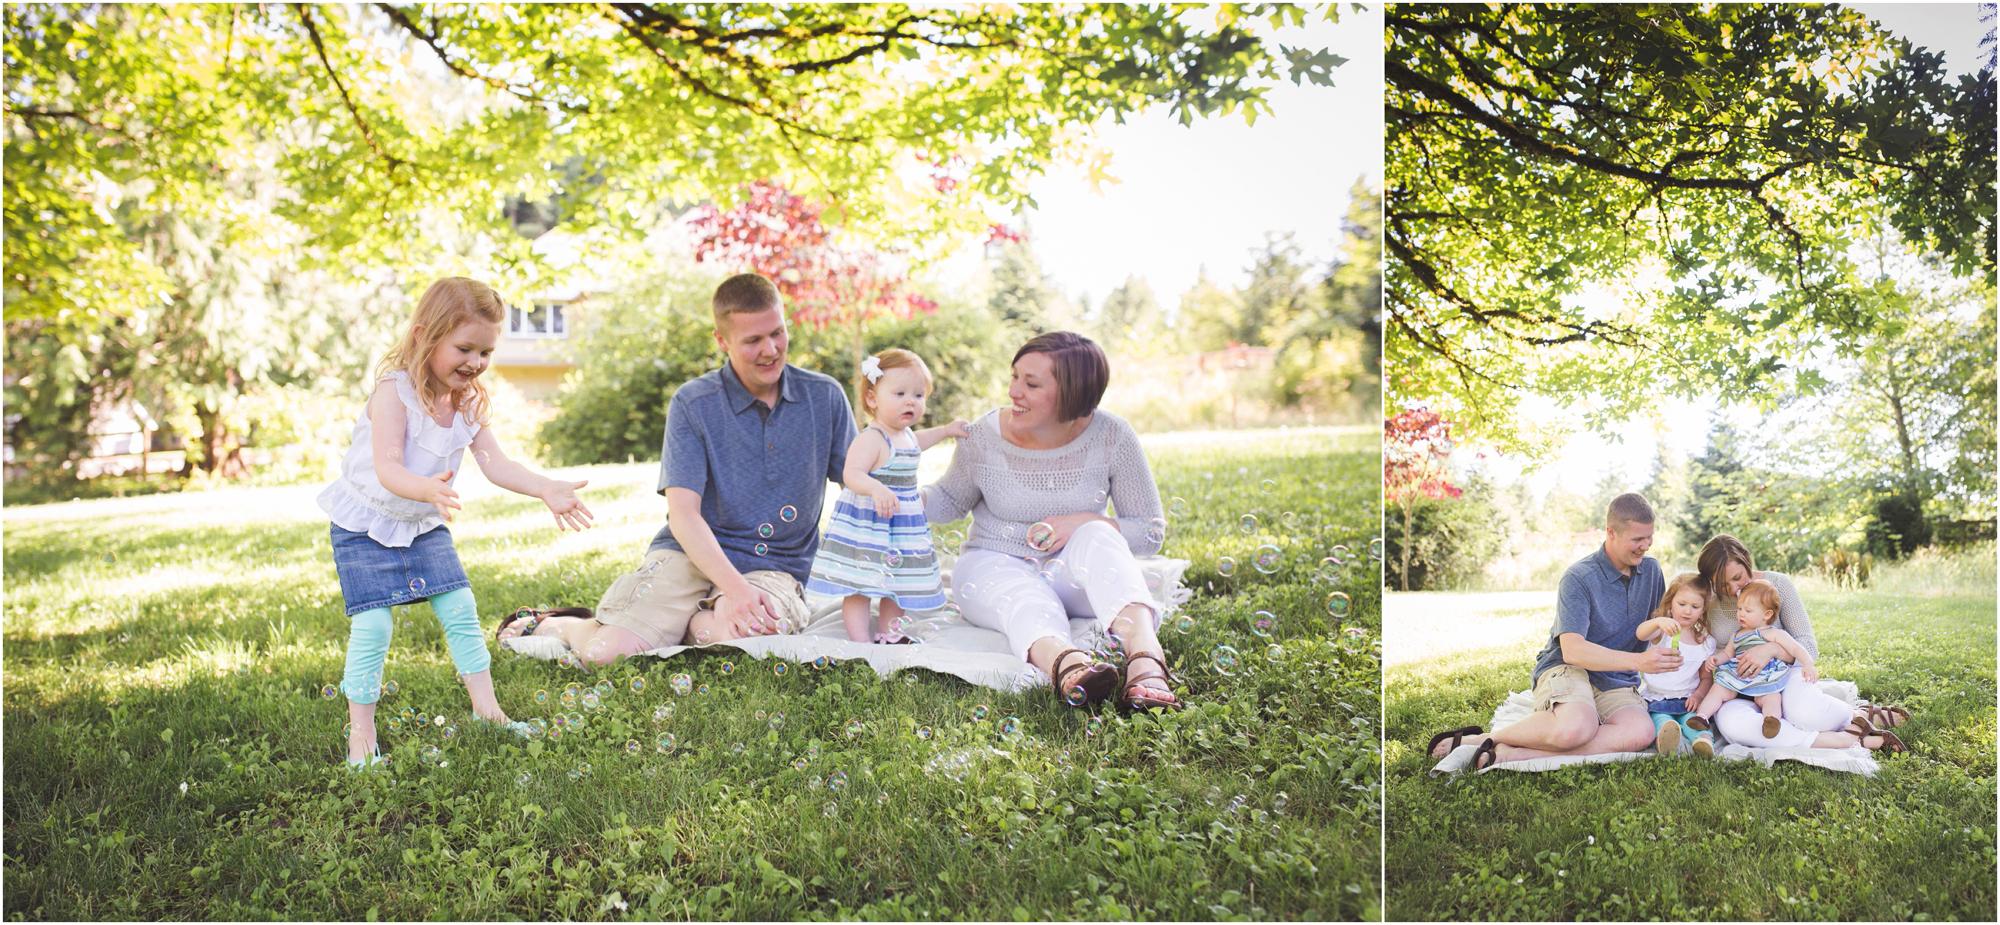 ashley vos photography seattle lifestyle family photographer_0298.jpg